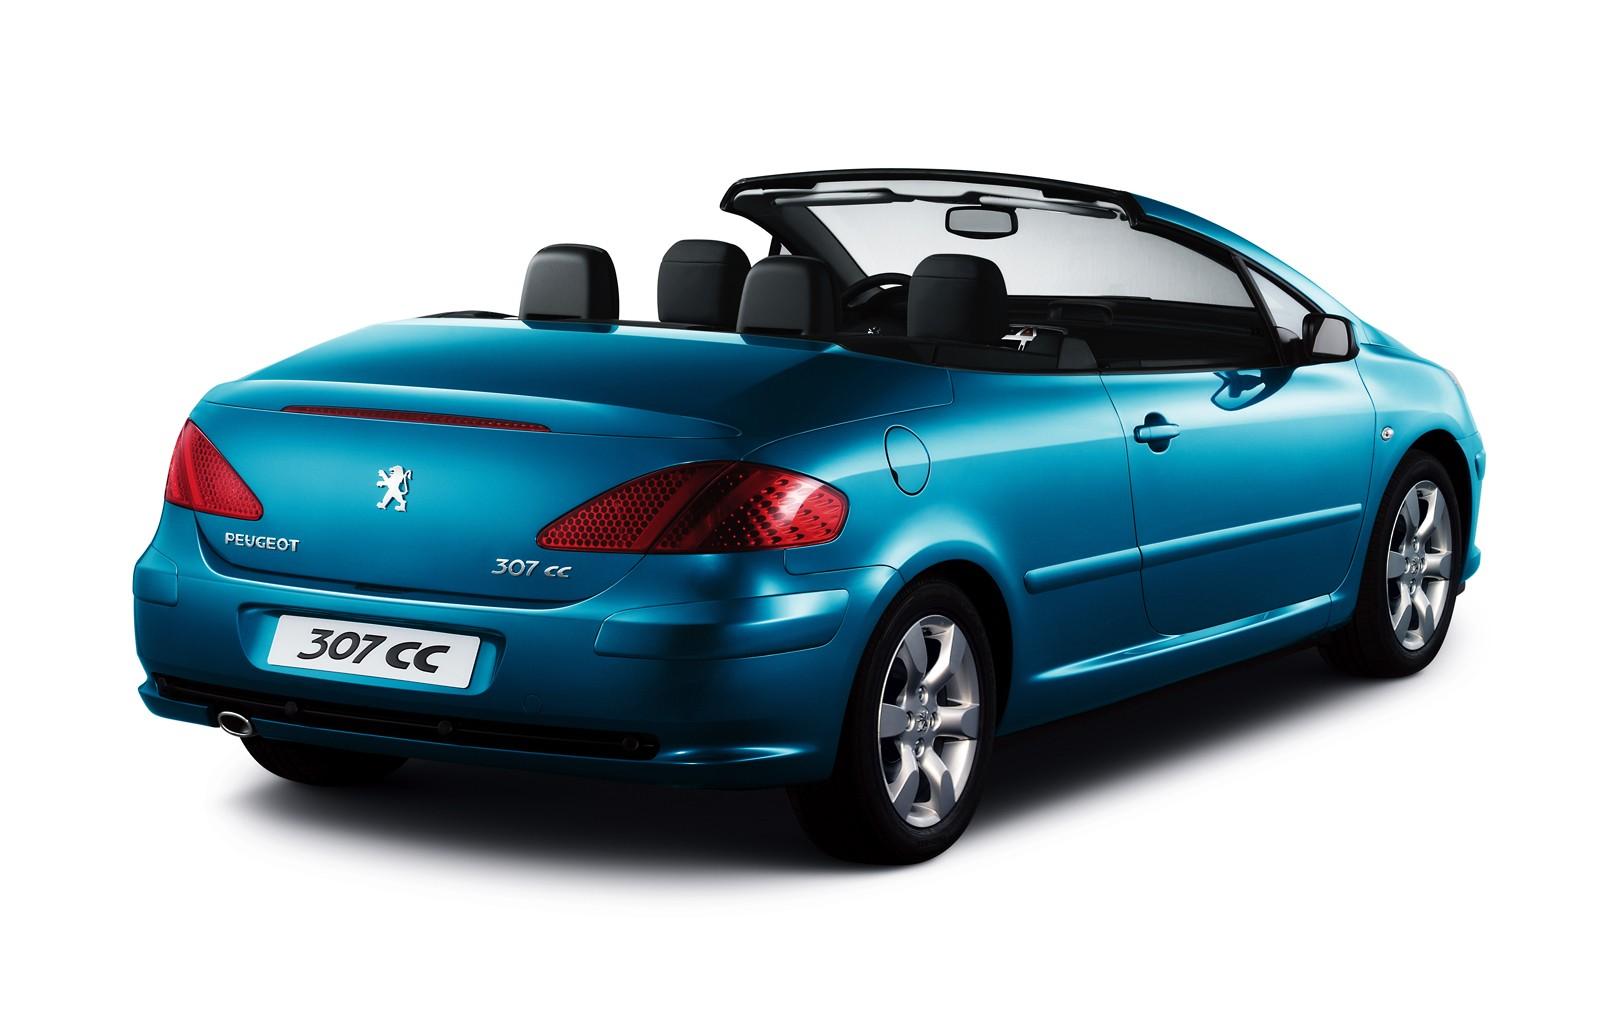 Peugeot 307 Cc Specs  U0026 Photos